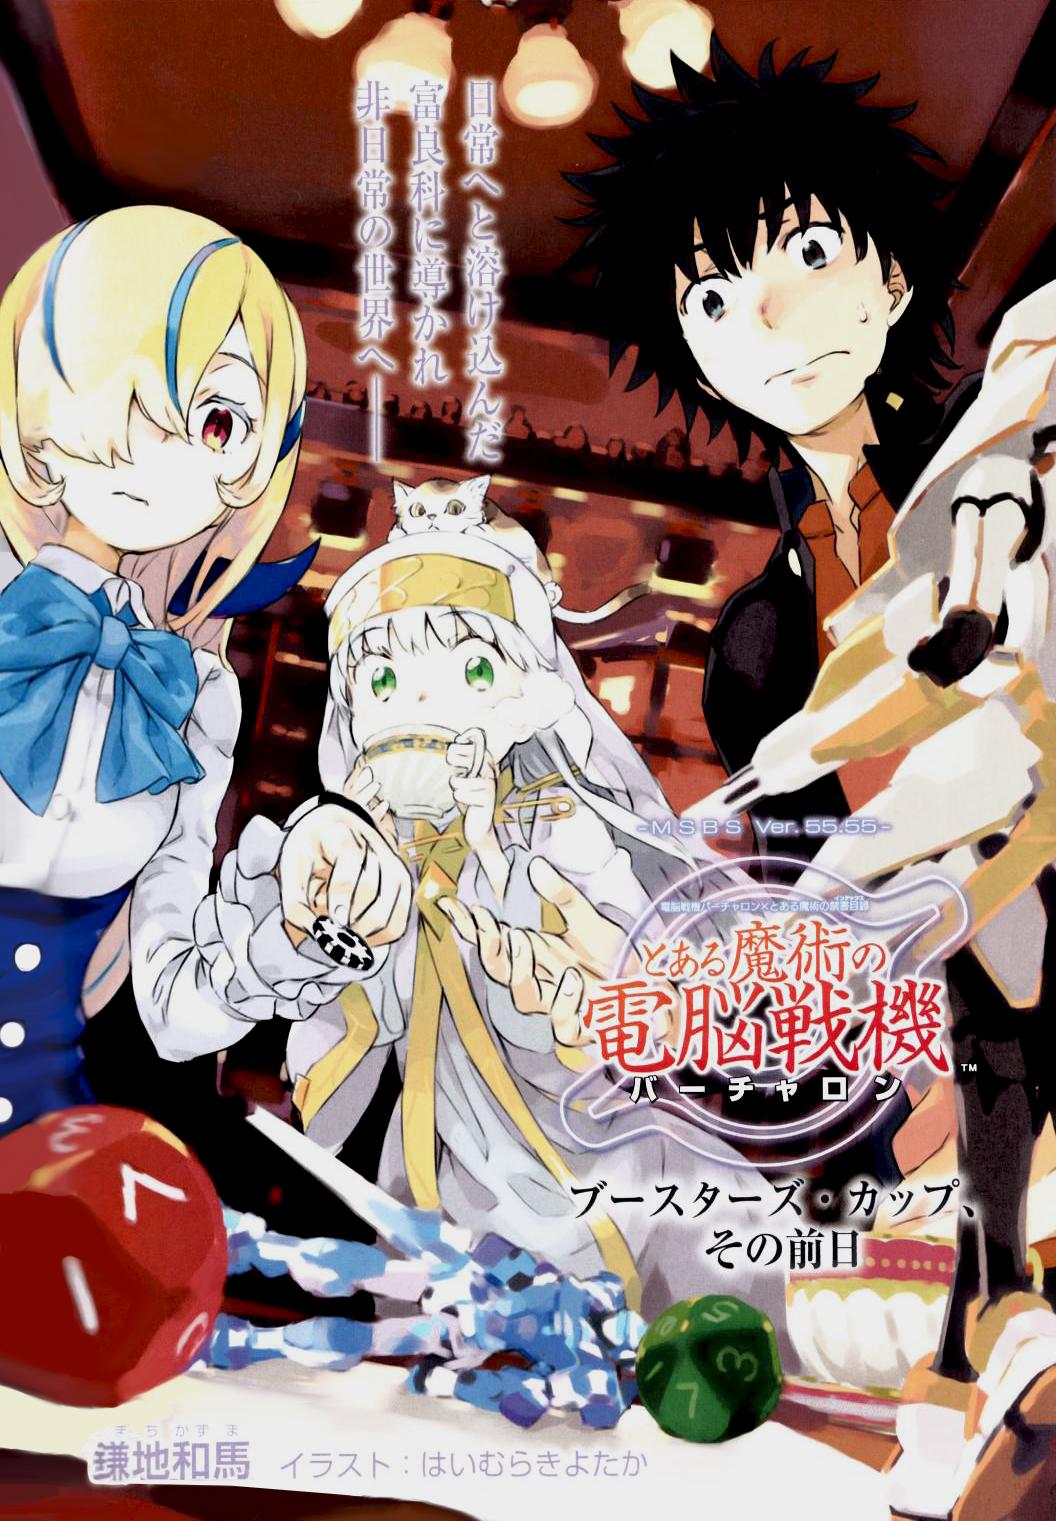 Aru no pdf index light novel majutsu to